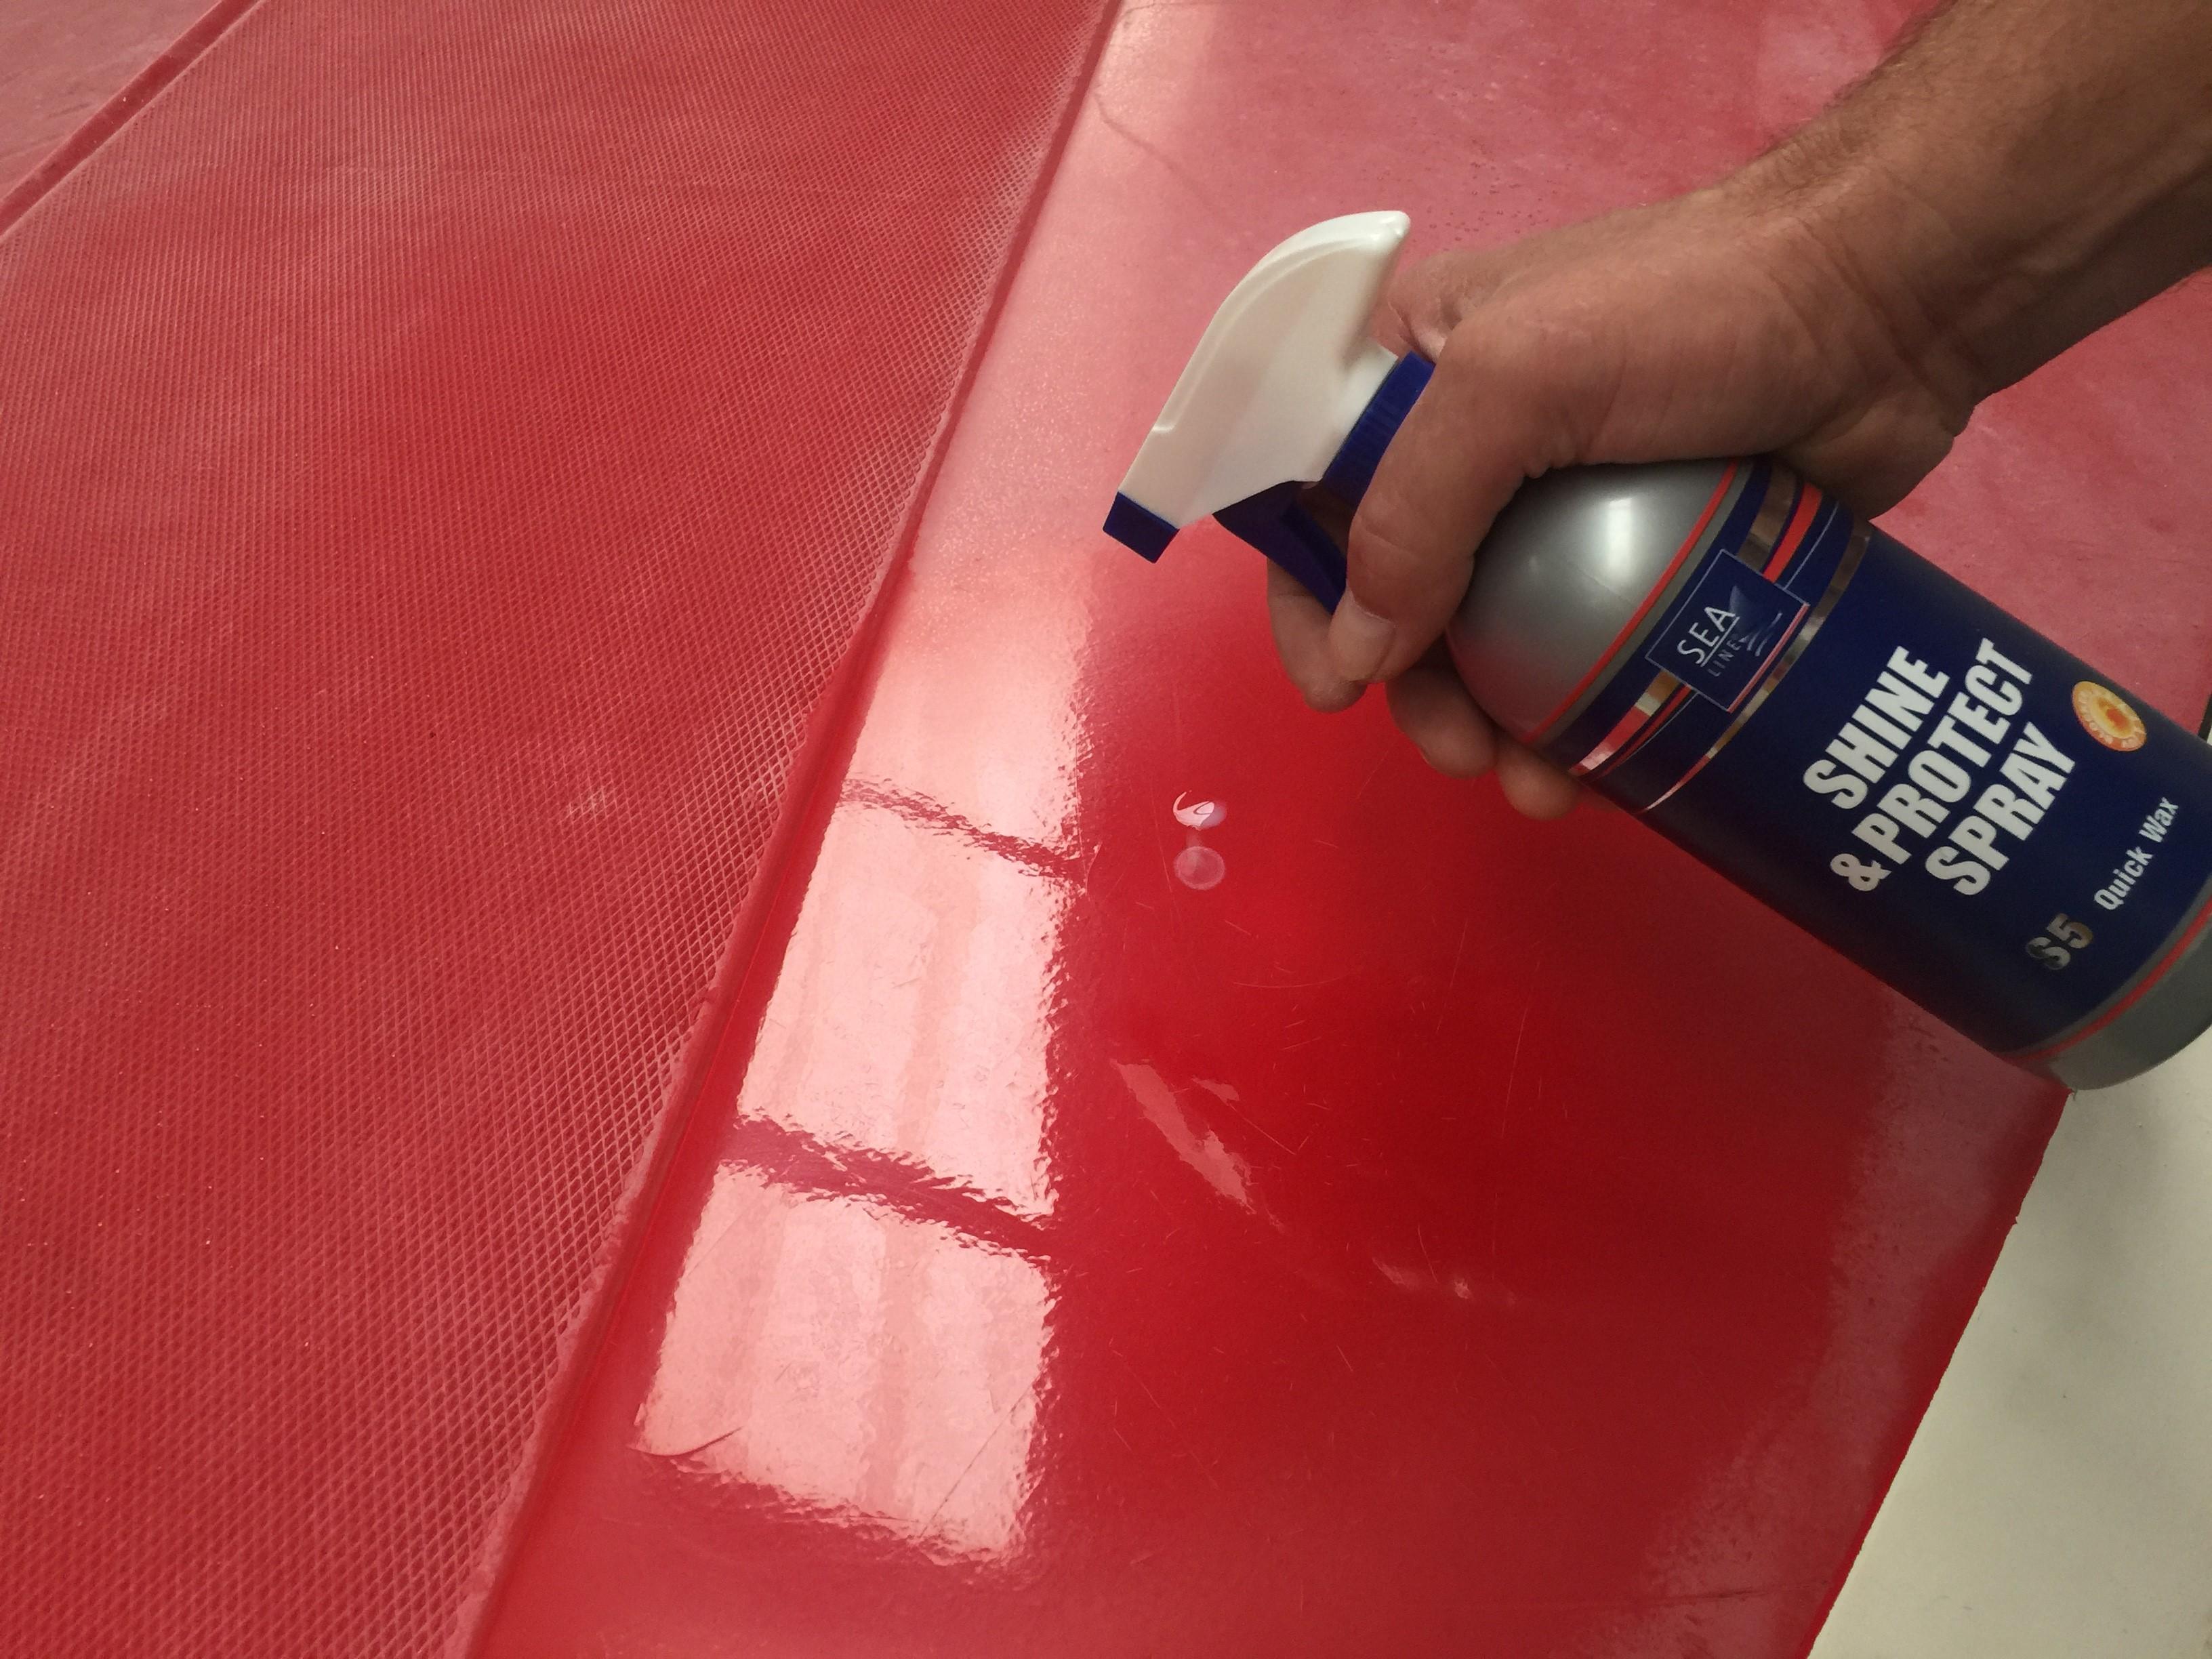 Sealine S5 quick wax